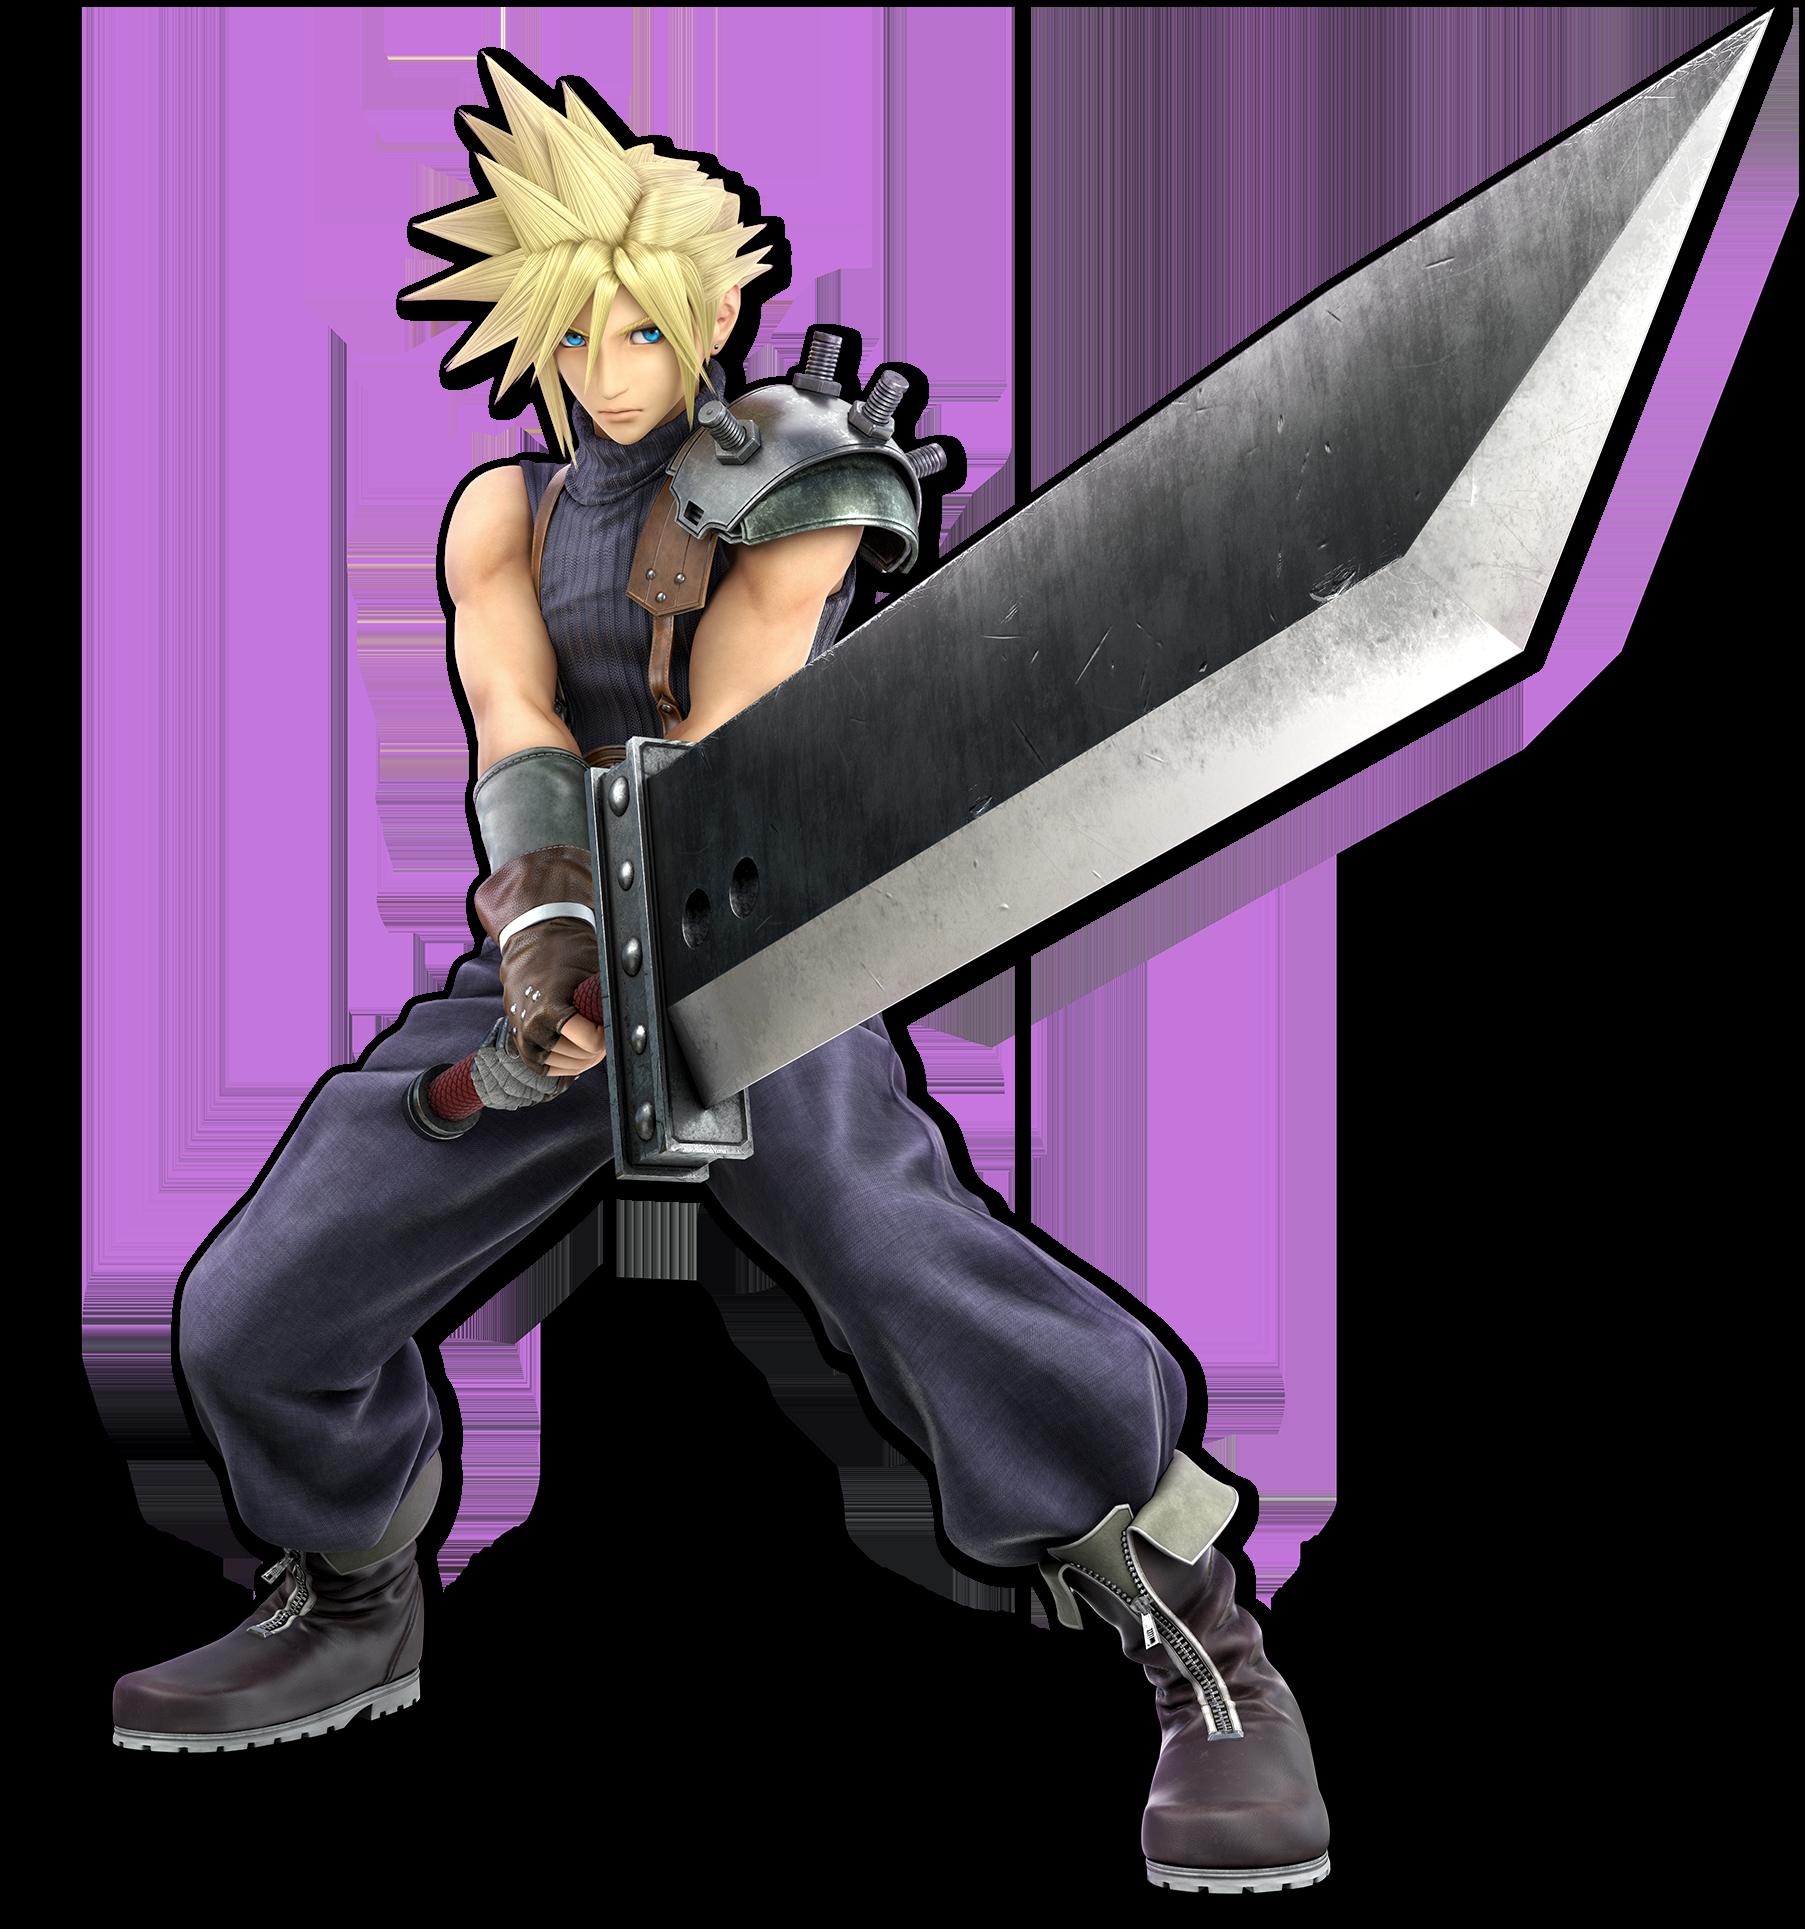 Square Enix: Infinite Wars